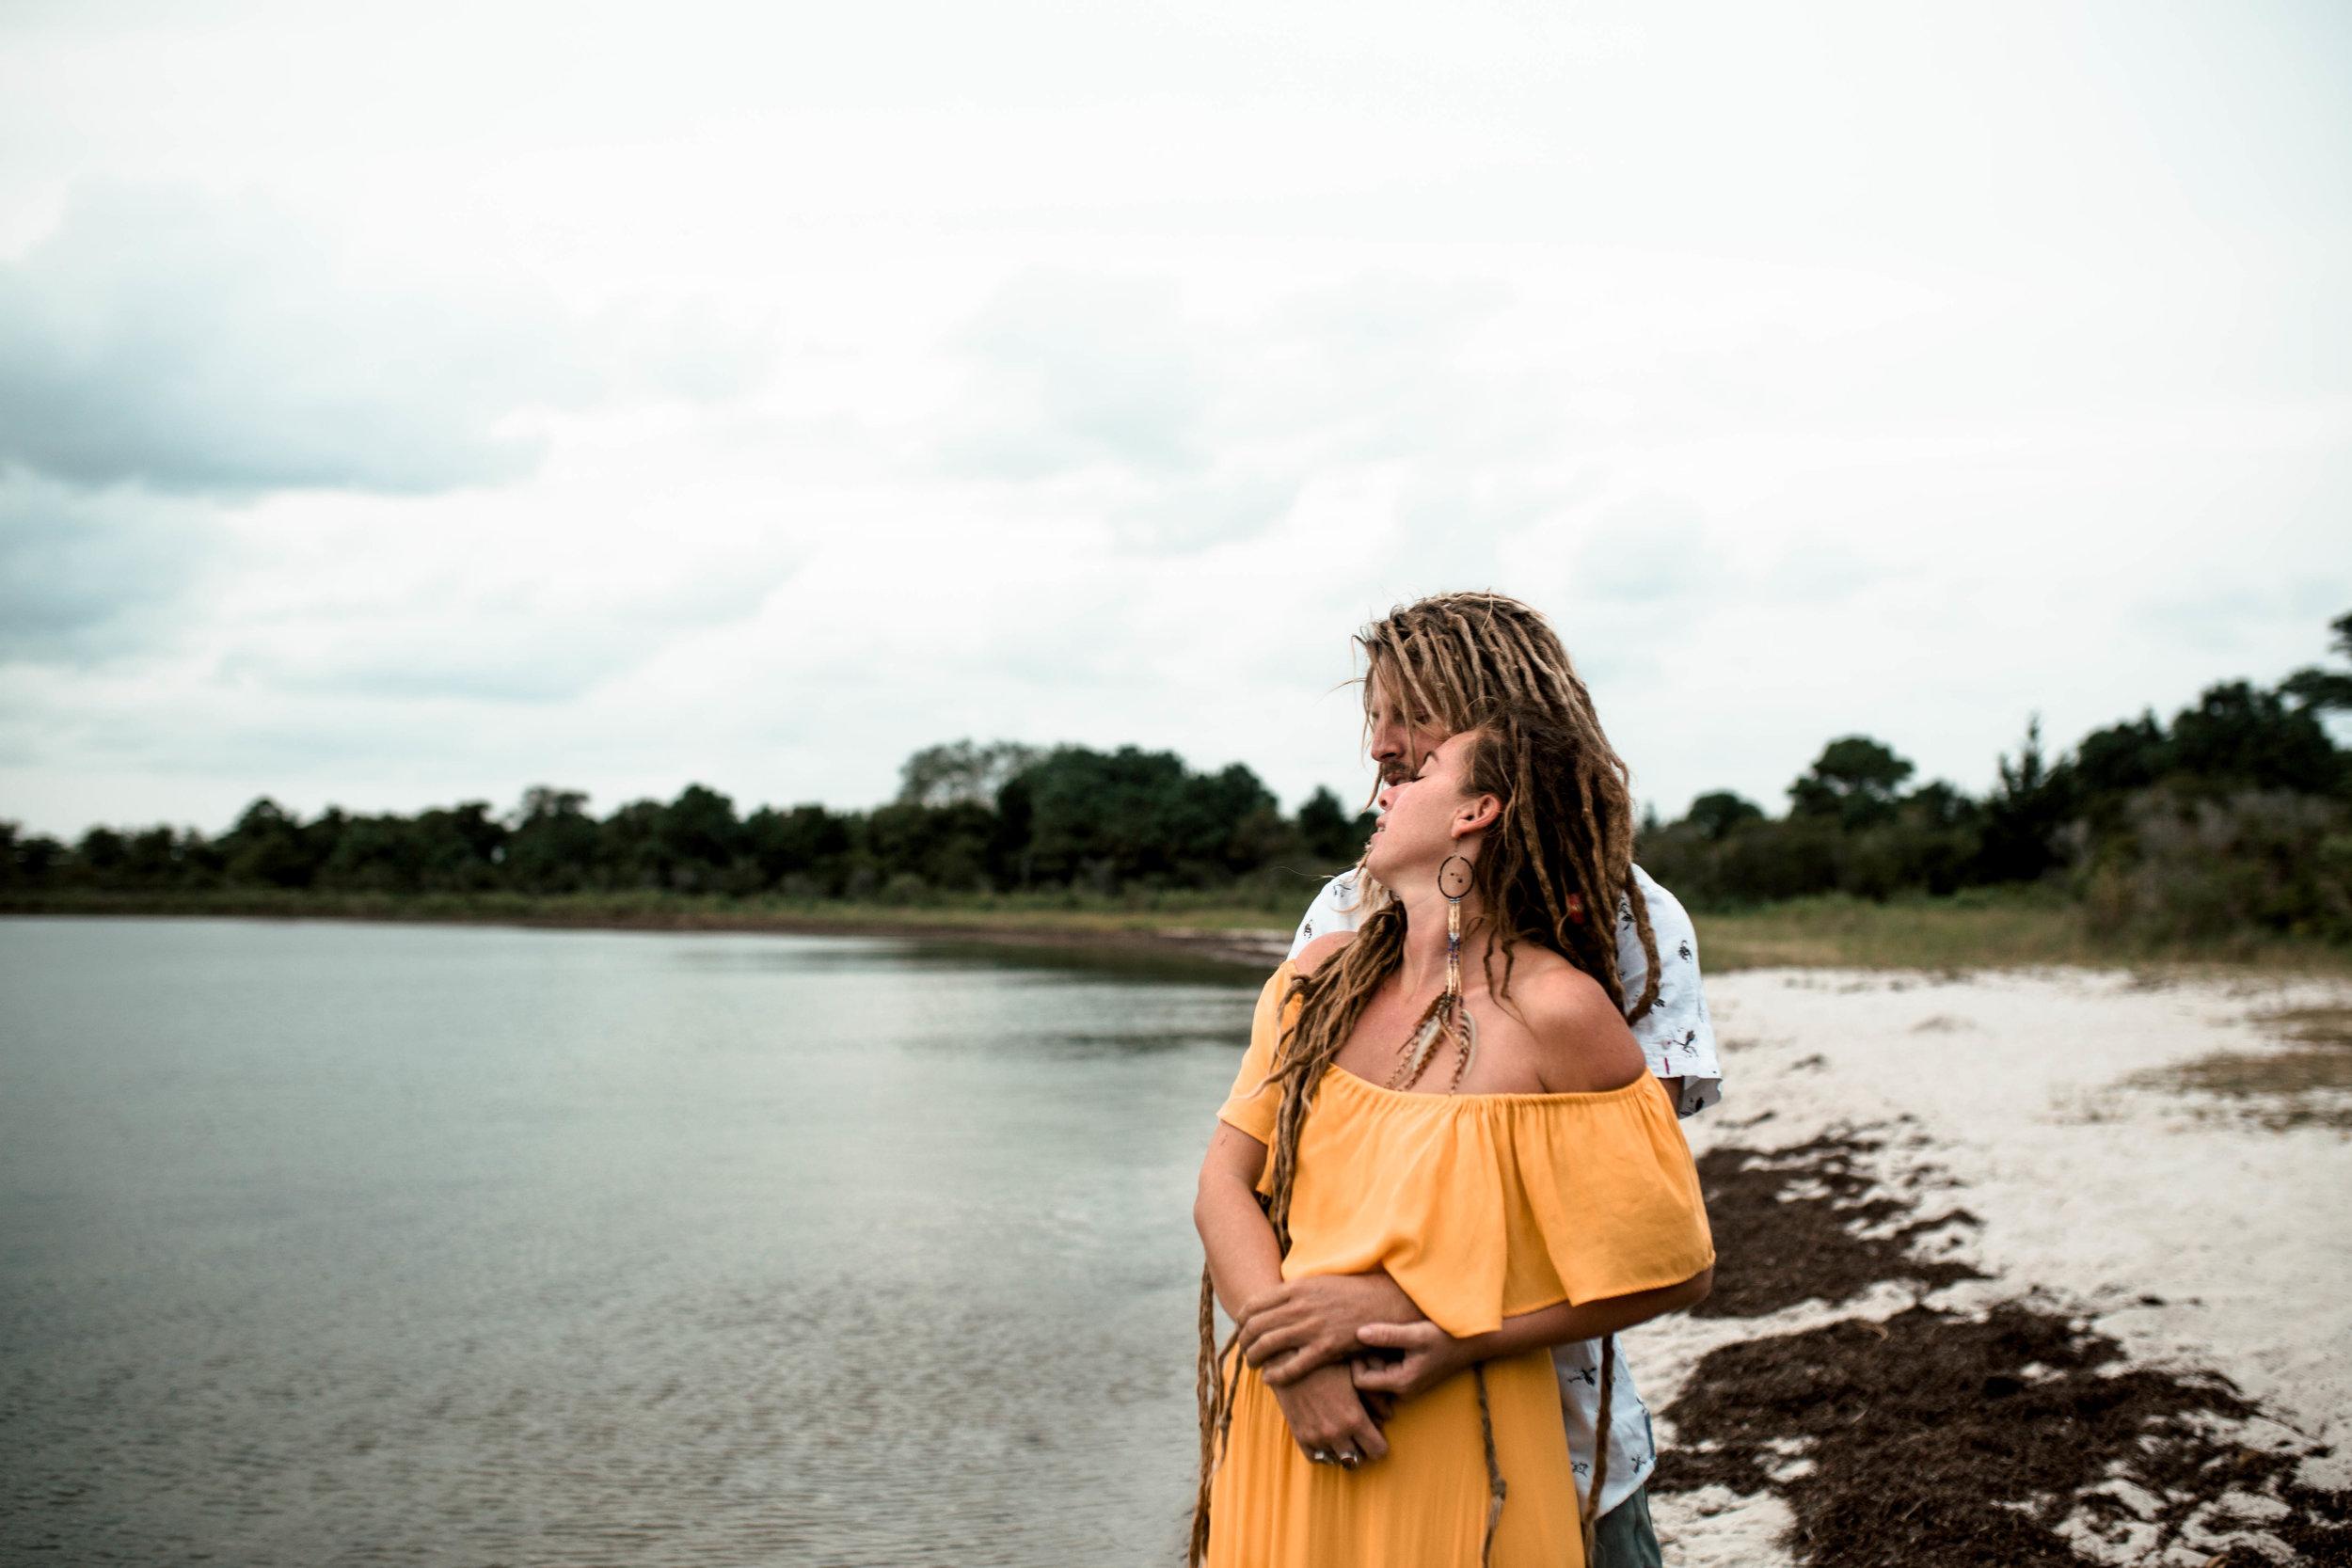 Assateague Island Photographer - Family Photographer - Pittsburgh Family Photographer - Beach Photography-0547.jpg